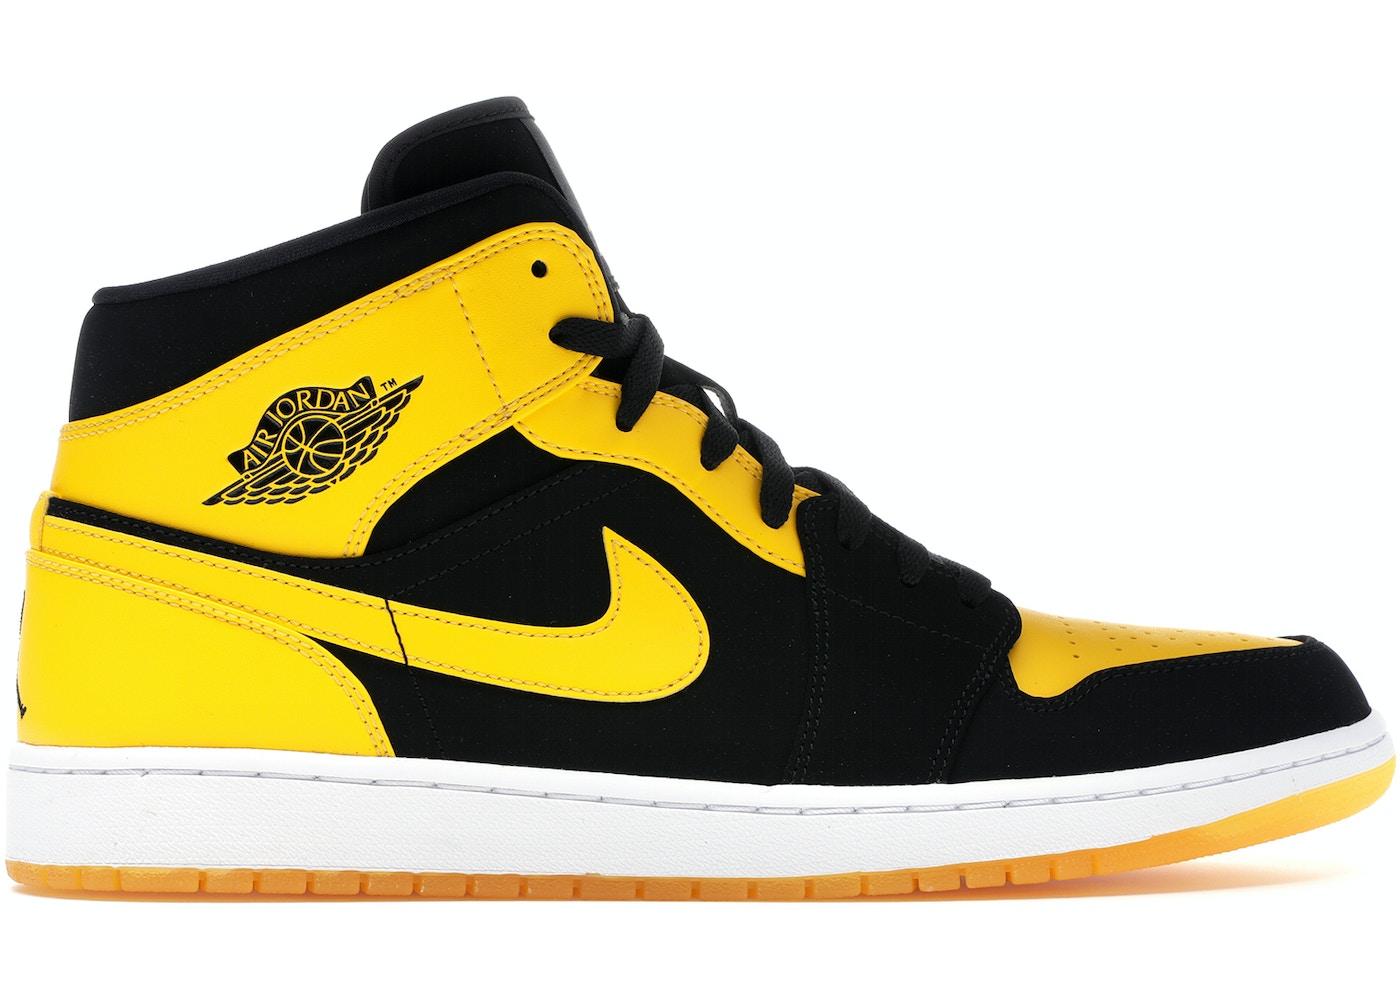 2f131dfd2be Air Jordan 1 Size 7.5 Shoes - Price Premium